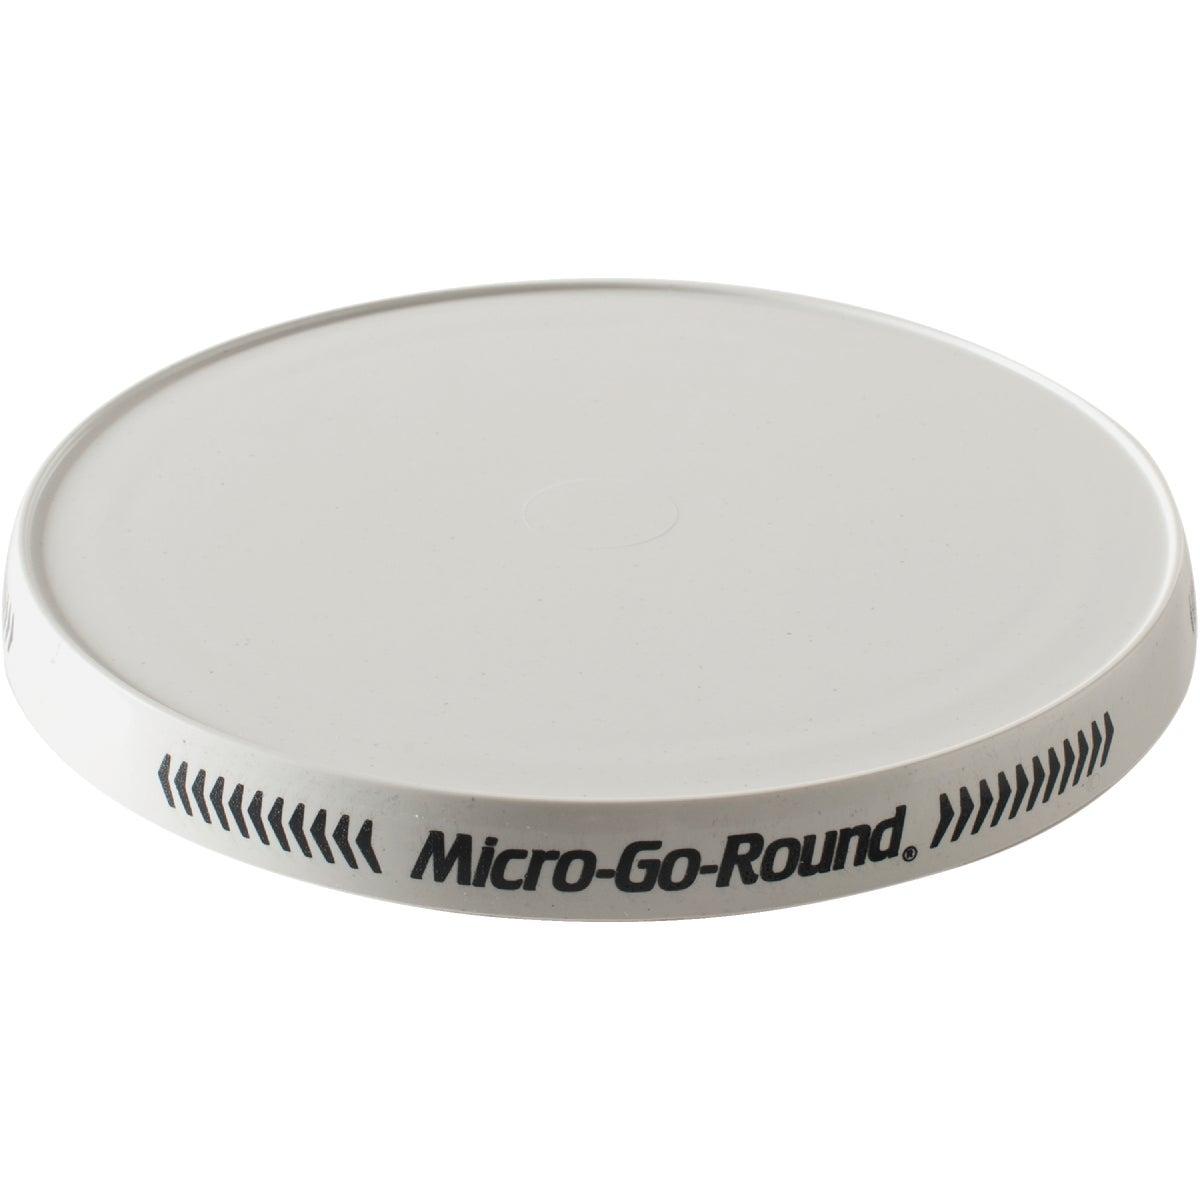 COMPACT MICRO-GO-ROUND - 62301 by Nordic Ware/reitenba